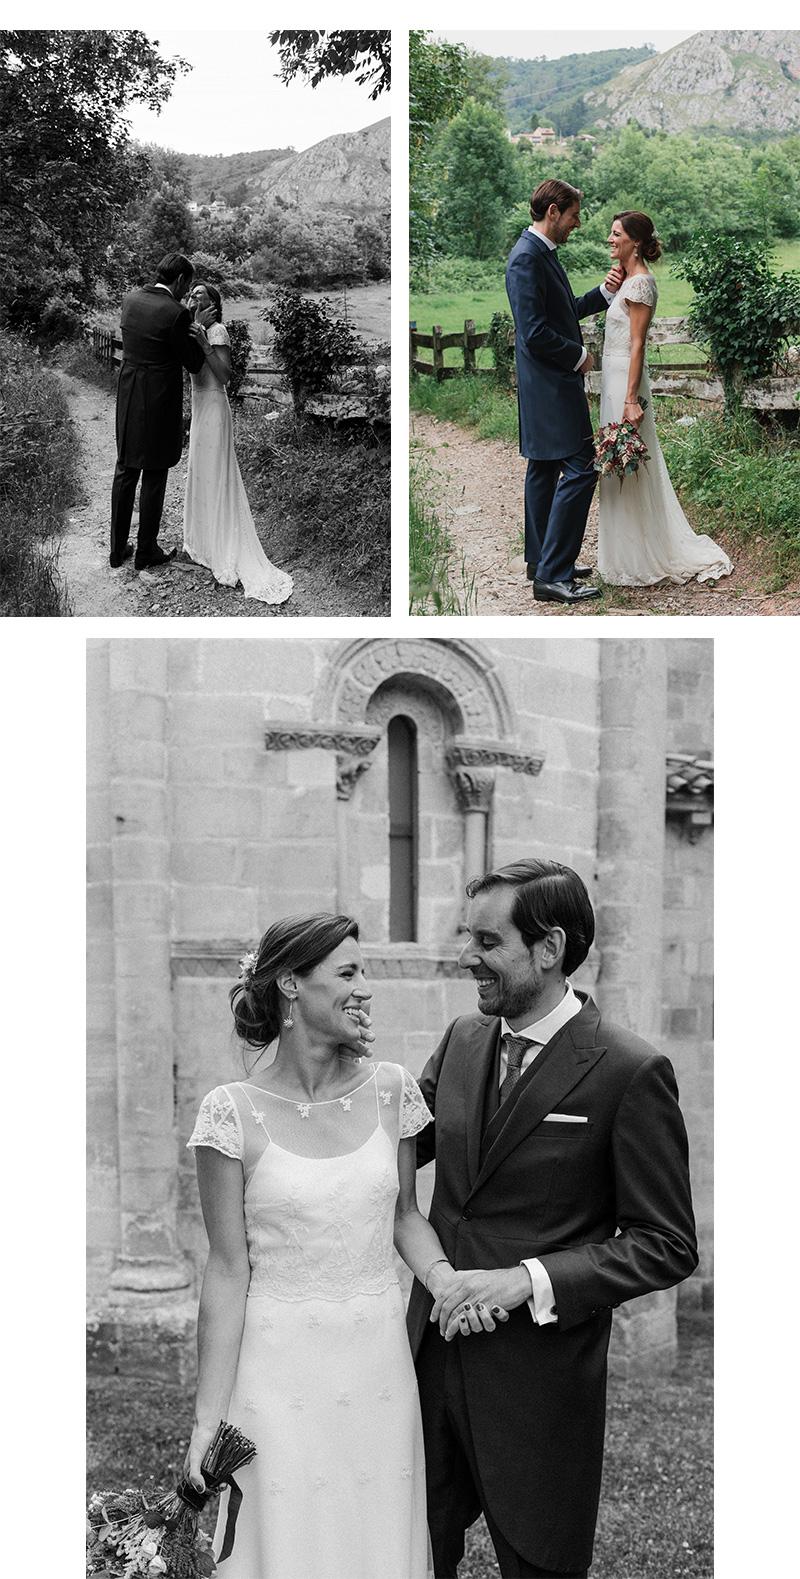 FOTOGRAFOS DE BODA EN ASTURIAS, M2VISUALSTUDIO, FOTOS DE PAREJA